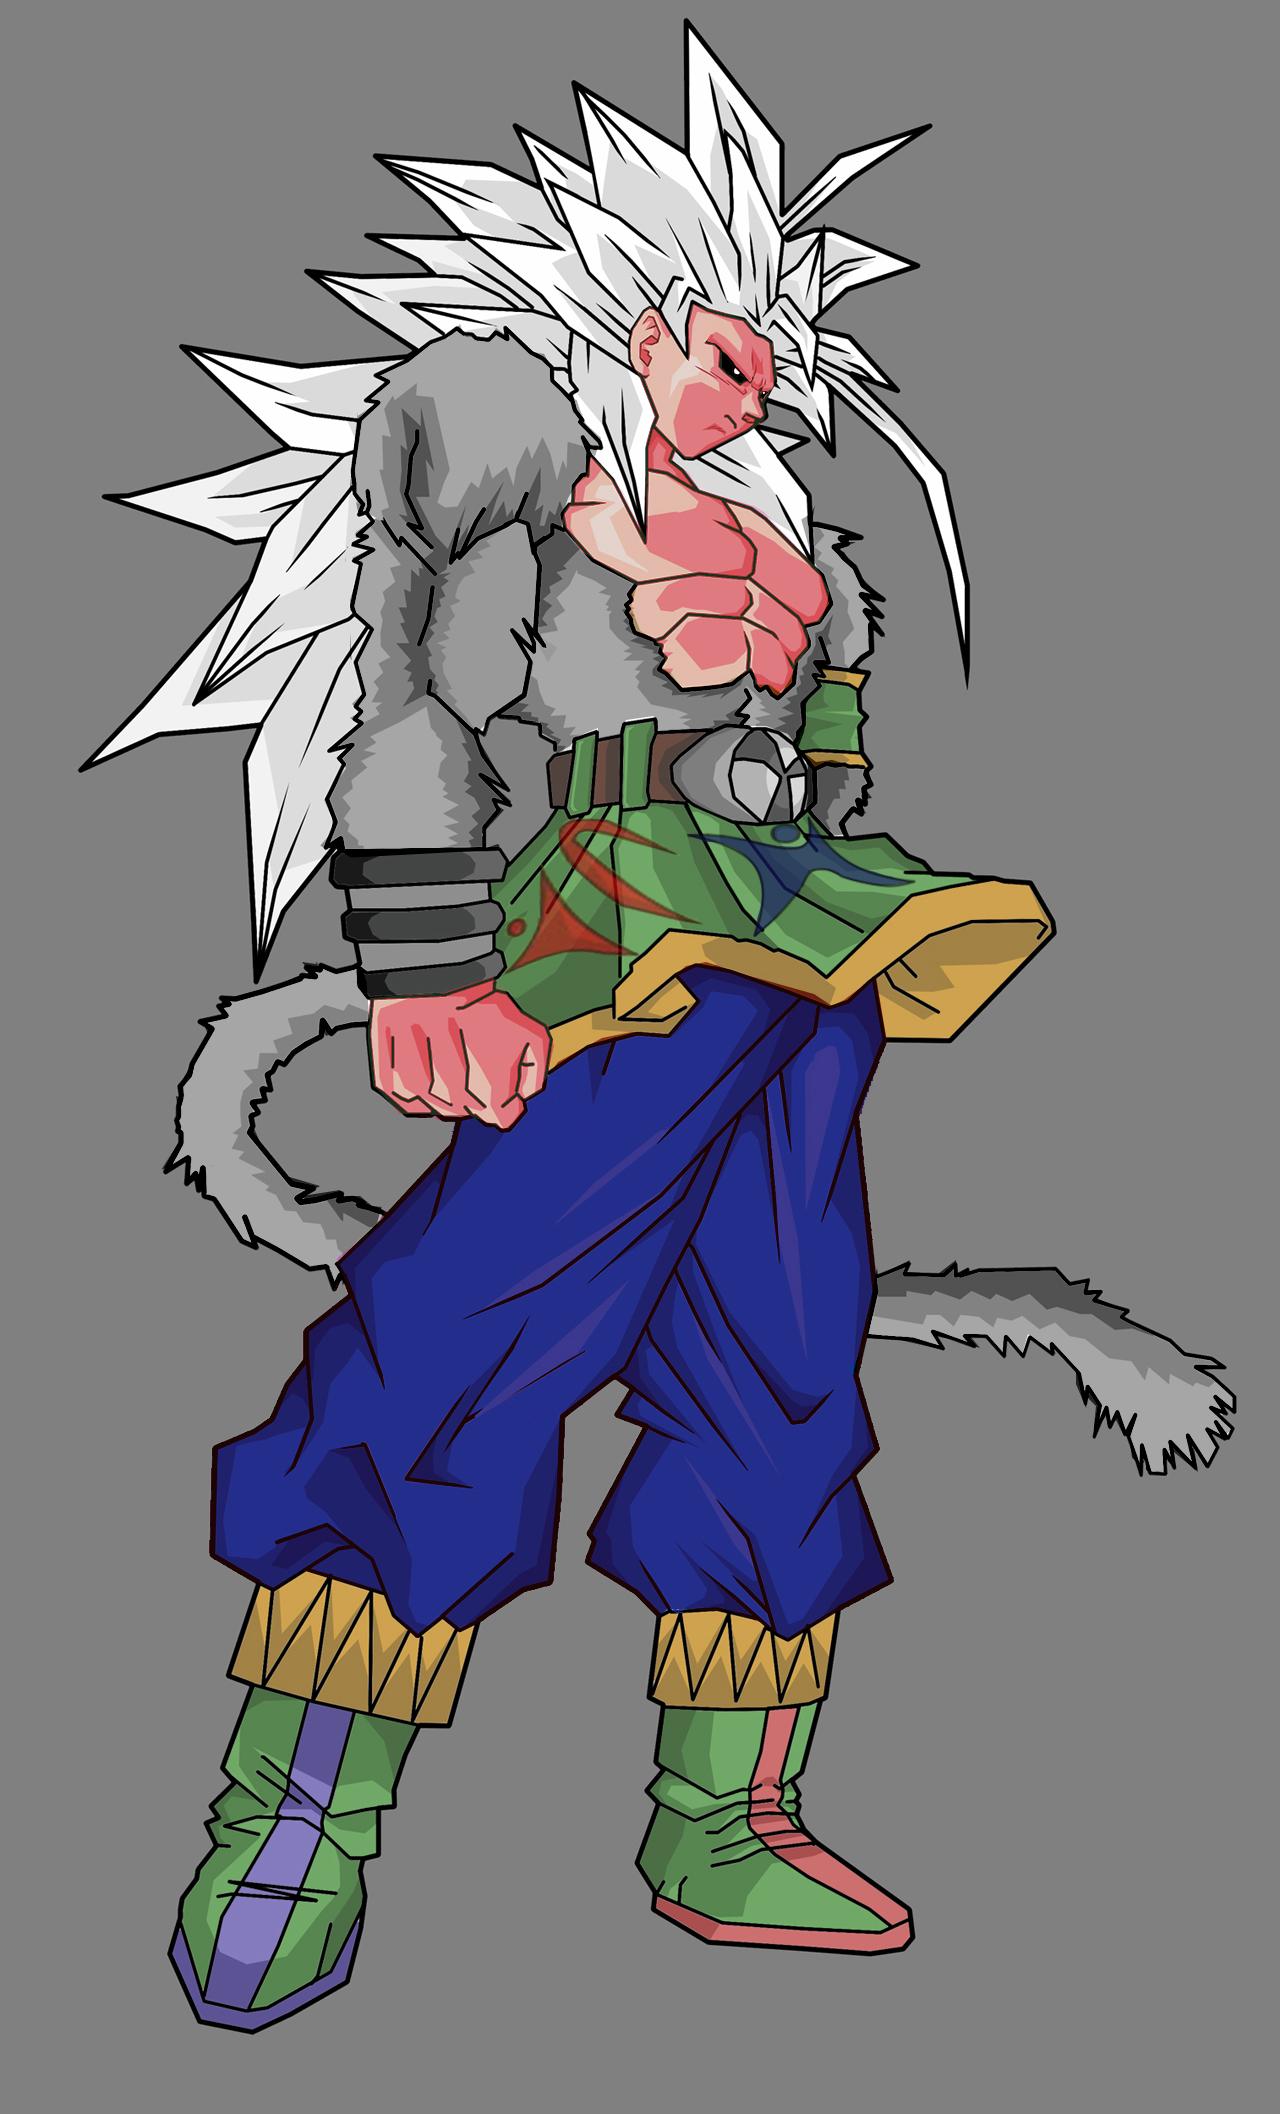 Regarde une feuille de personnage Ultimate_SS5_Goku_by_DragonballAF